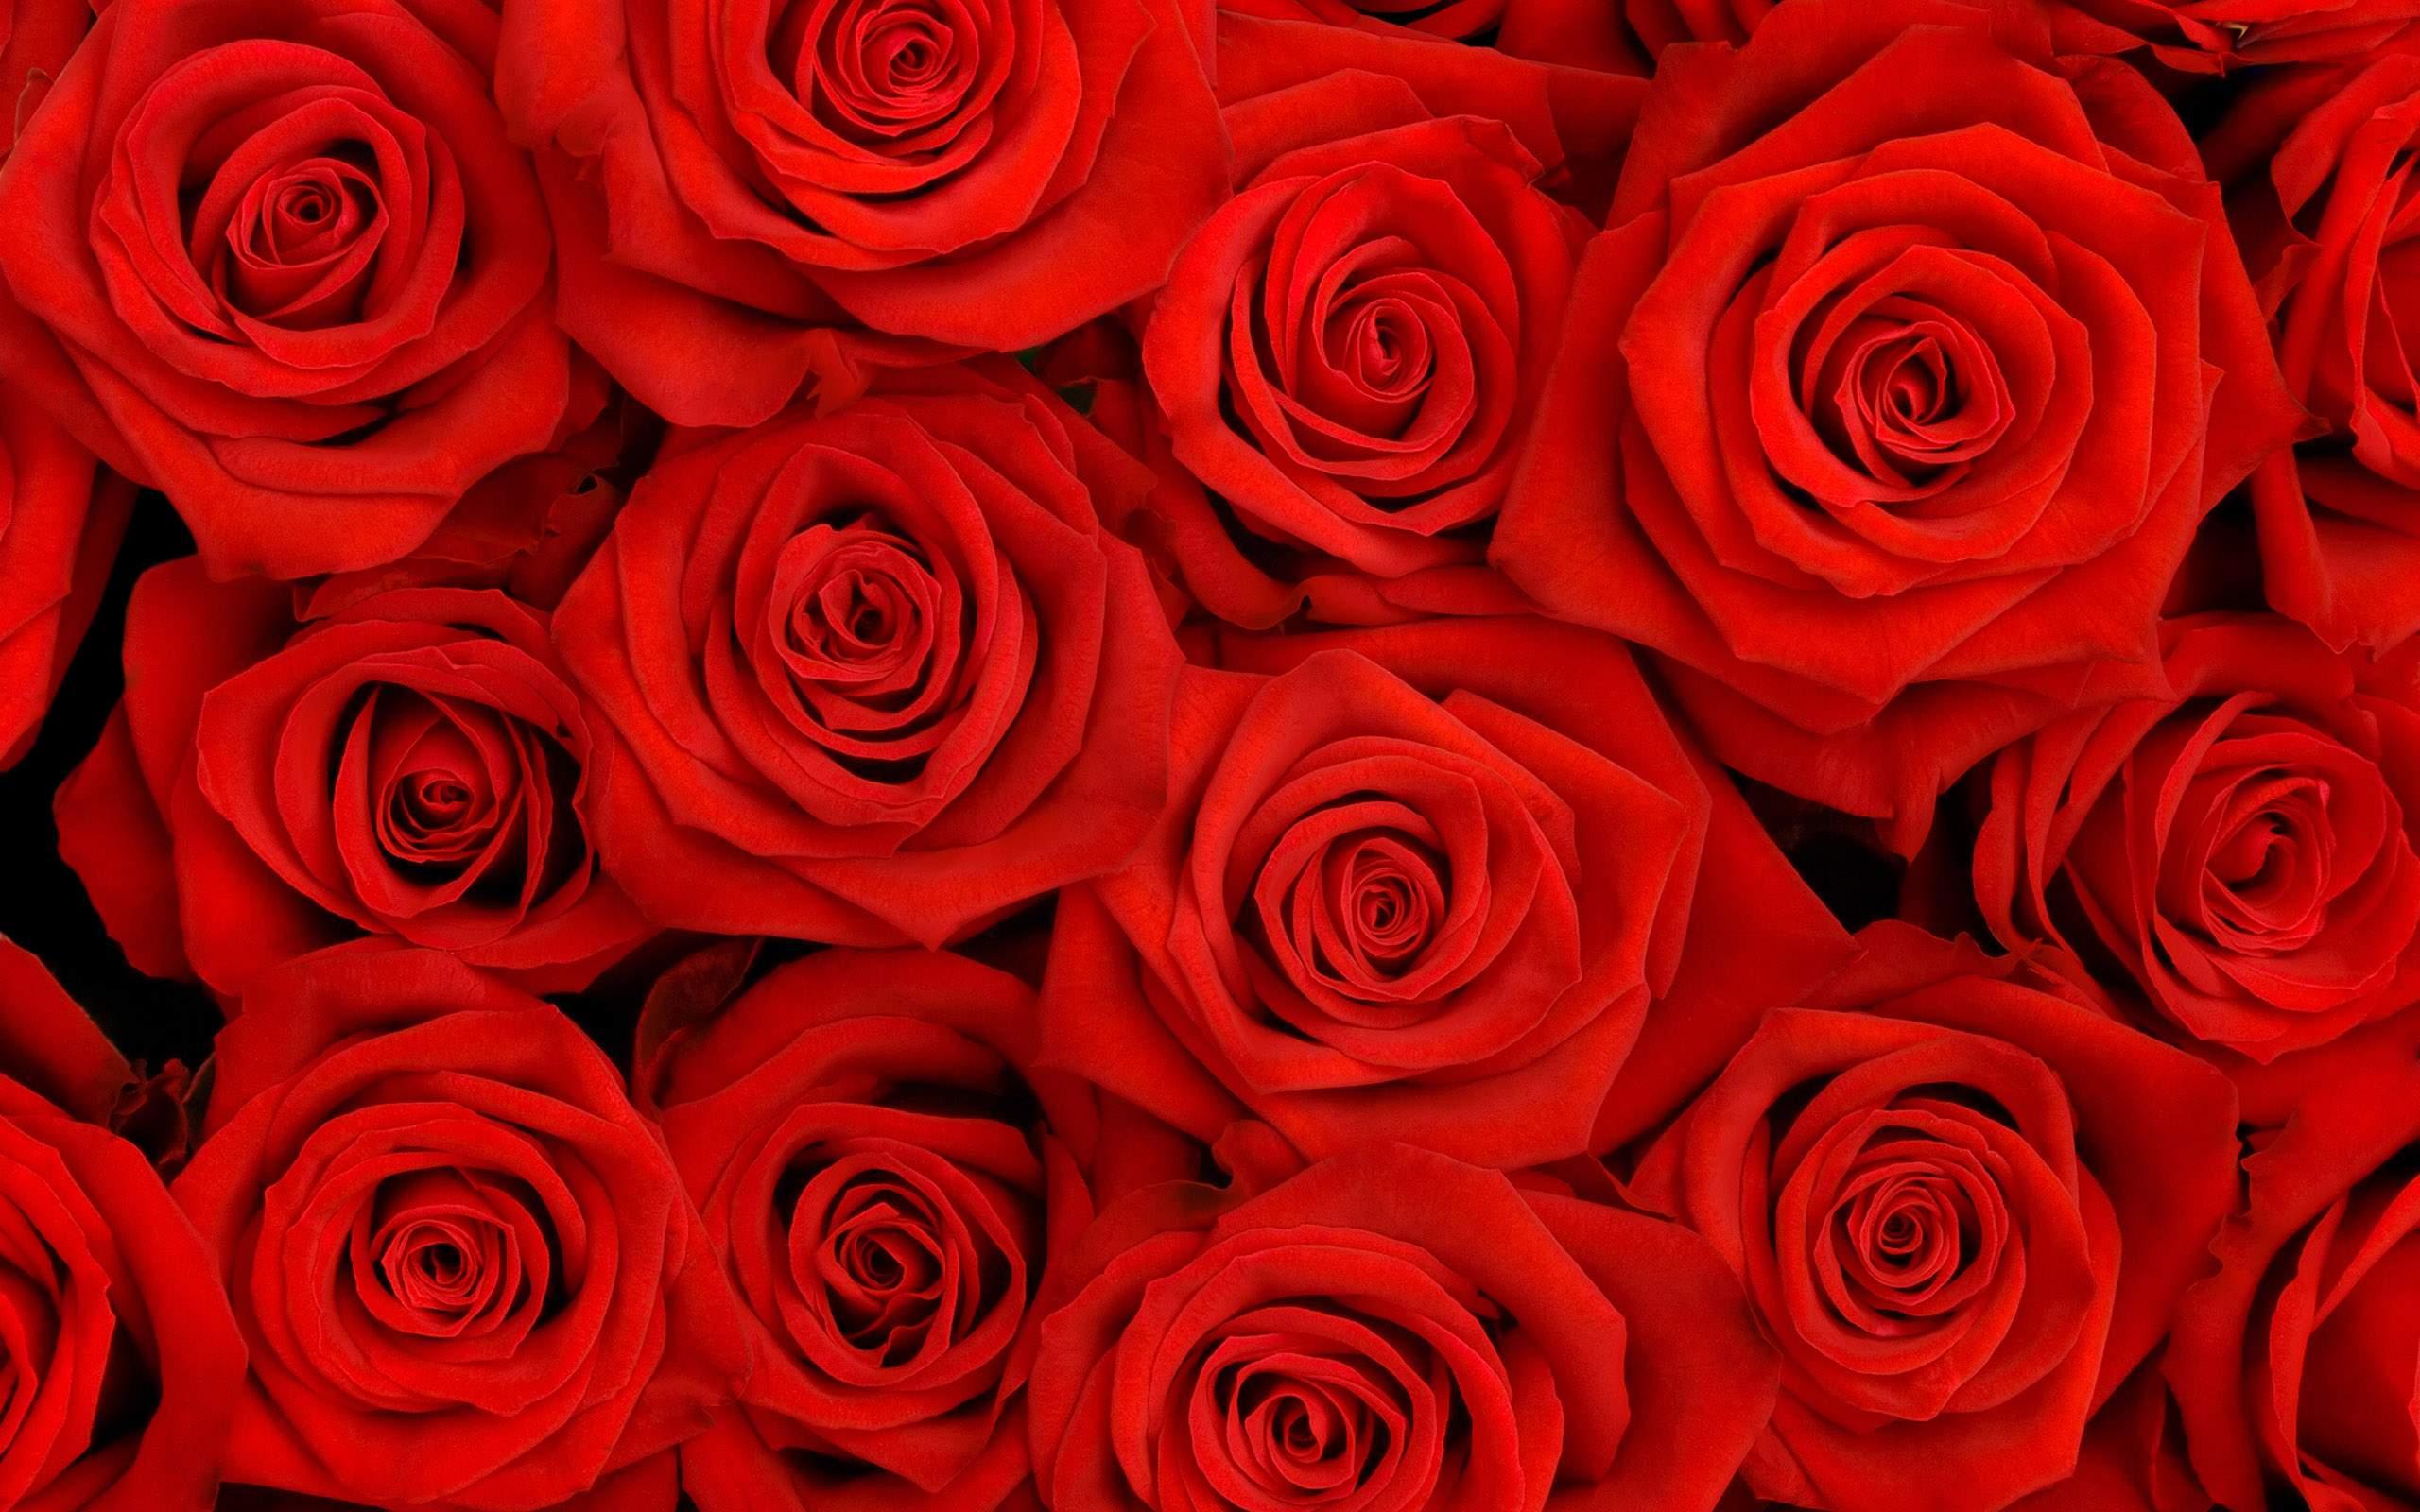 Rose Flowers Wallpaper Photos